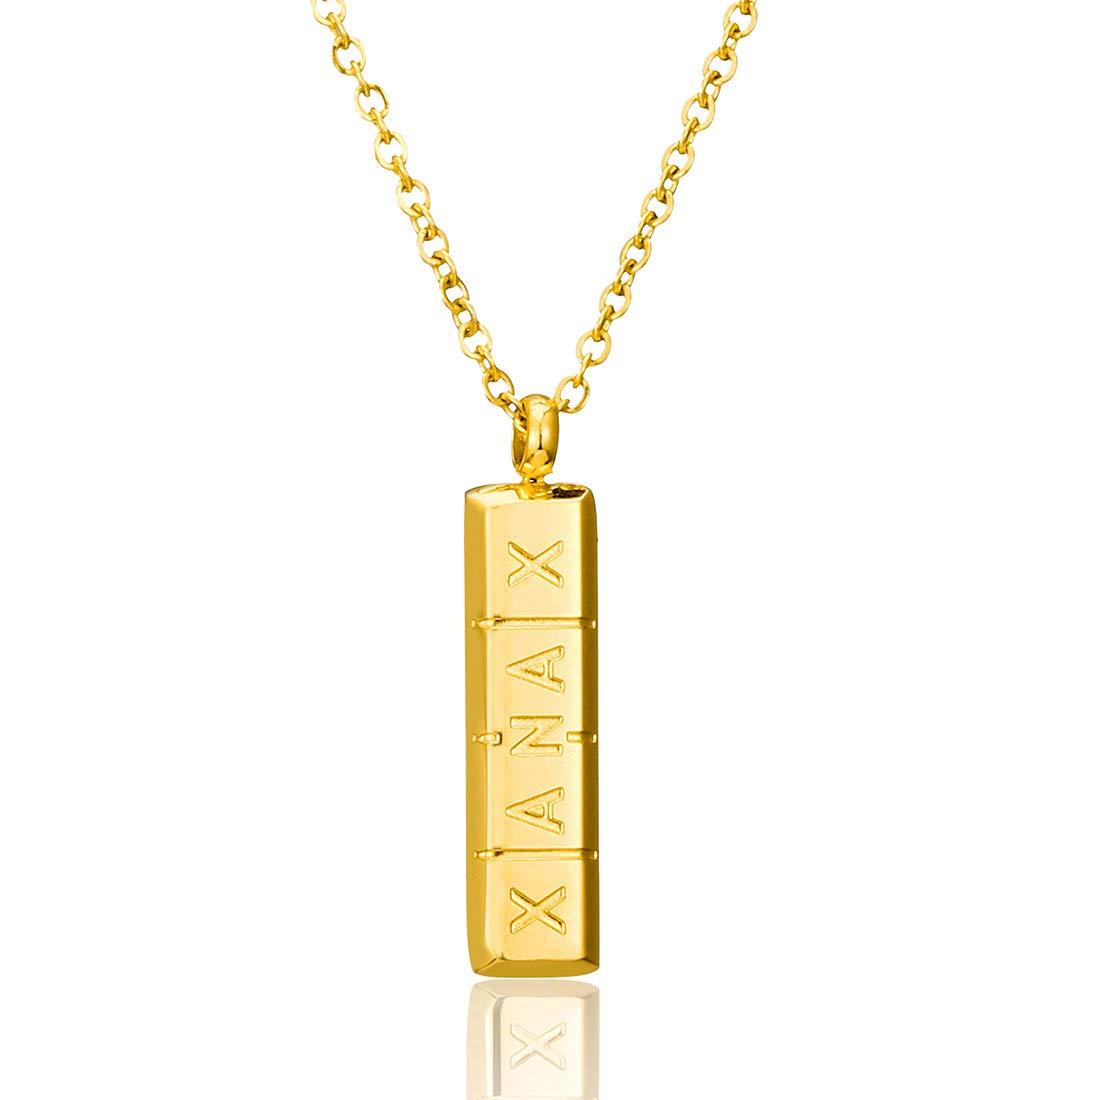 SKQIR Womens Girls Stainless Steel Xanax Pill ID Bar Pendant Necklace Jewelry Yiwu Suqi Jewelry Co. Ltd SKQIR-1704 Silver